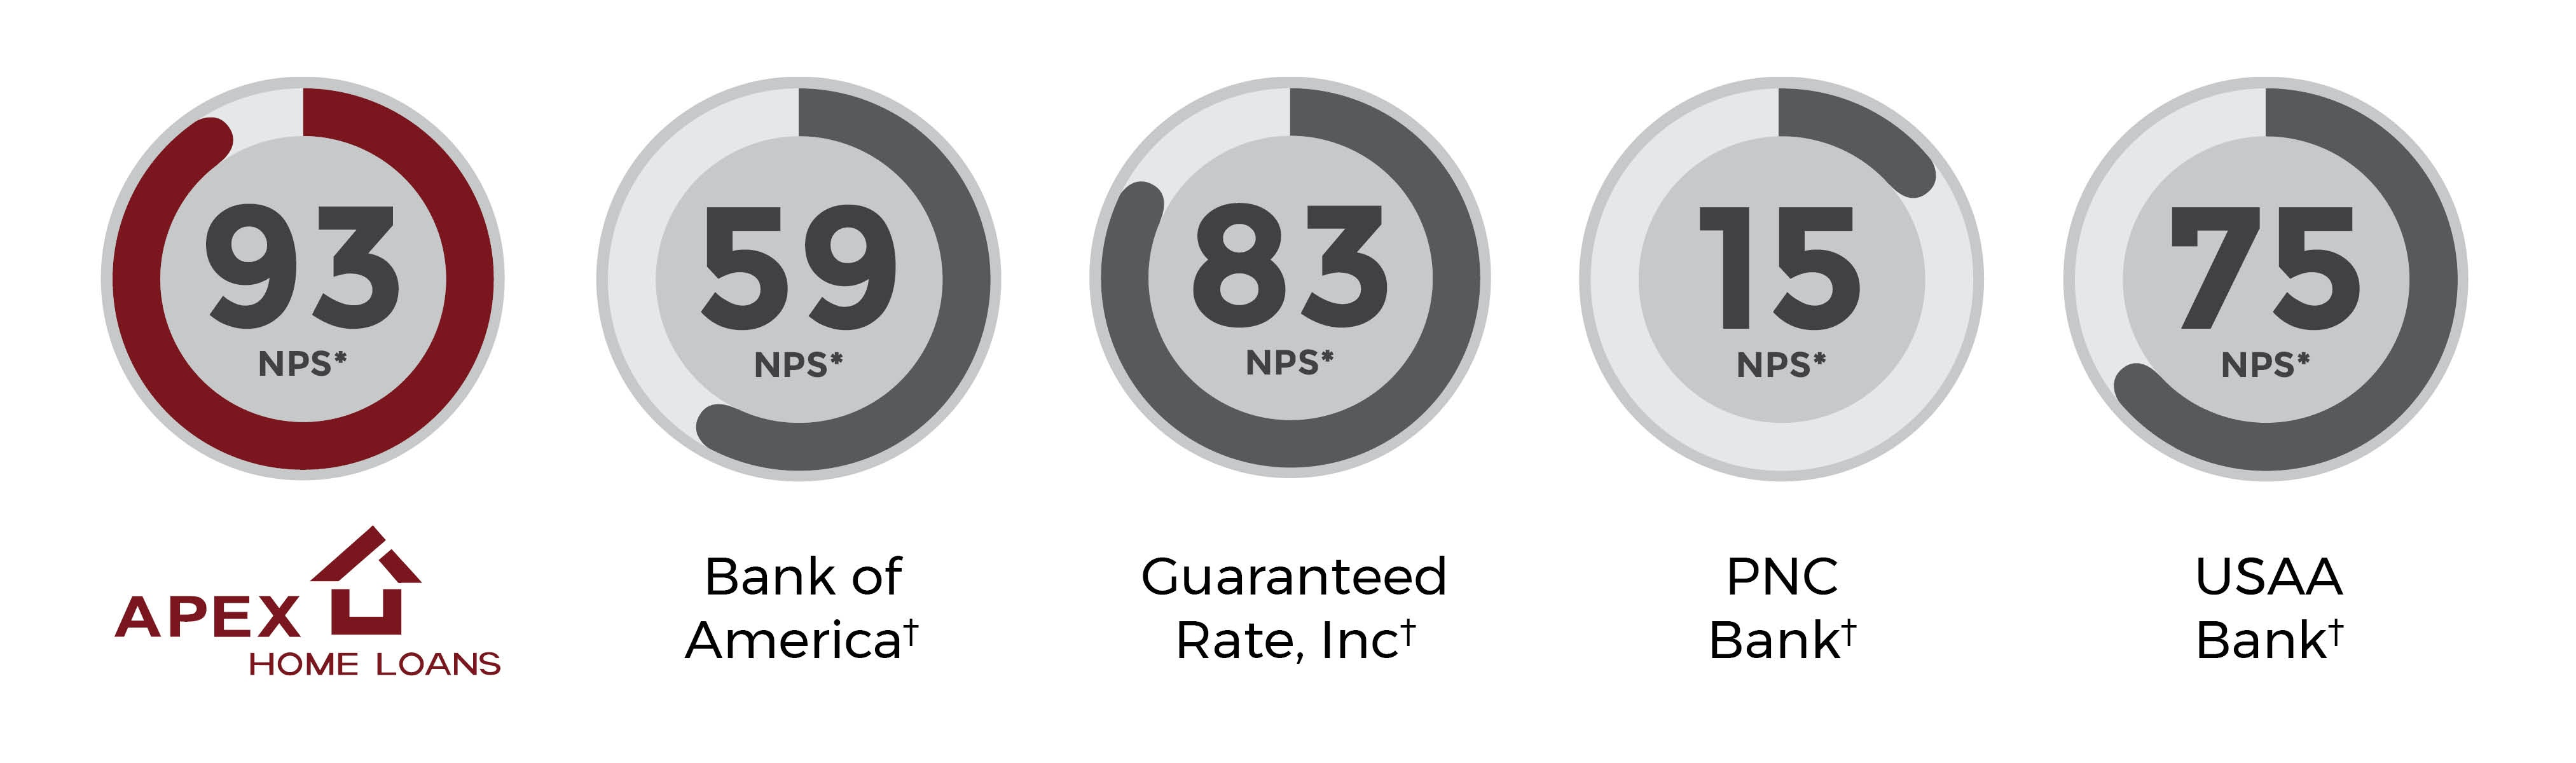 Apex NPS competitors